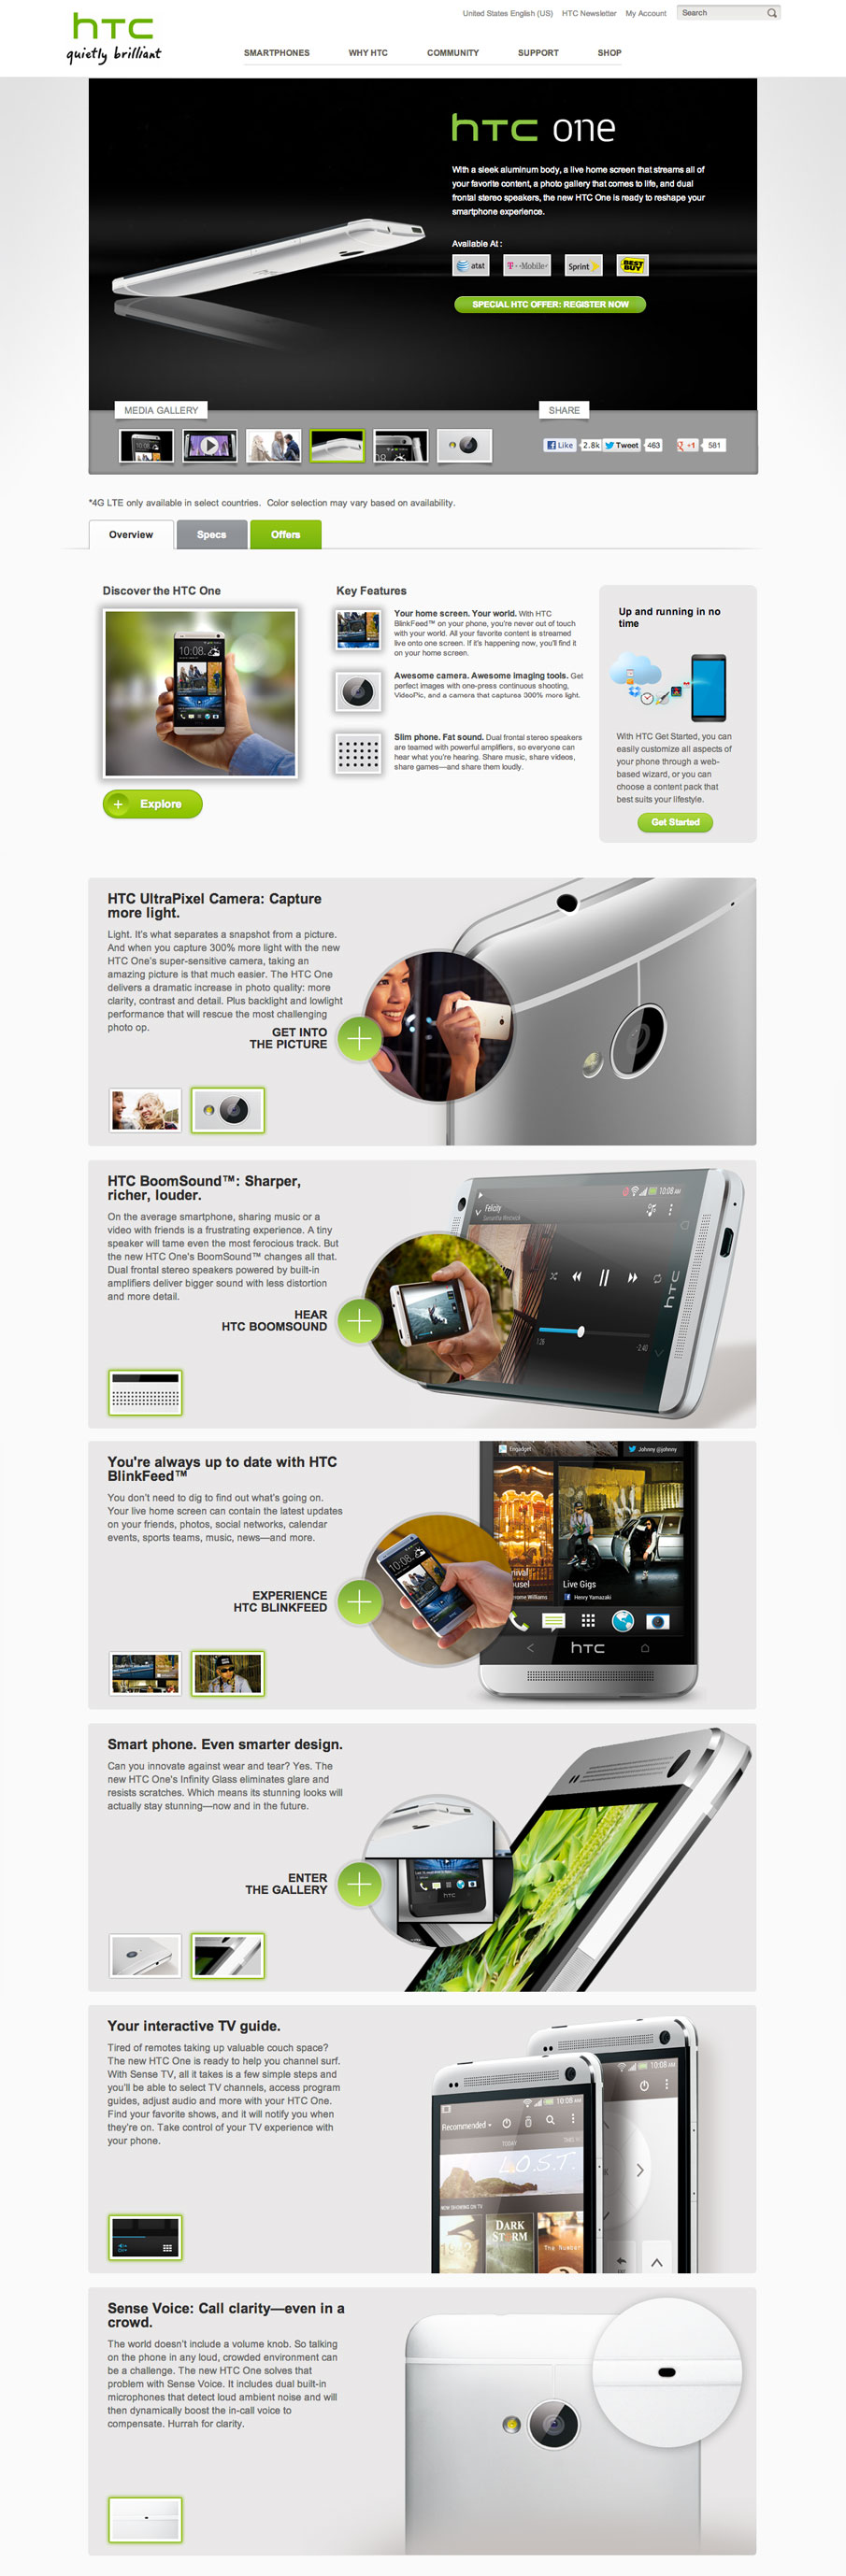 HTC_PP_B_905.jpg